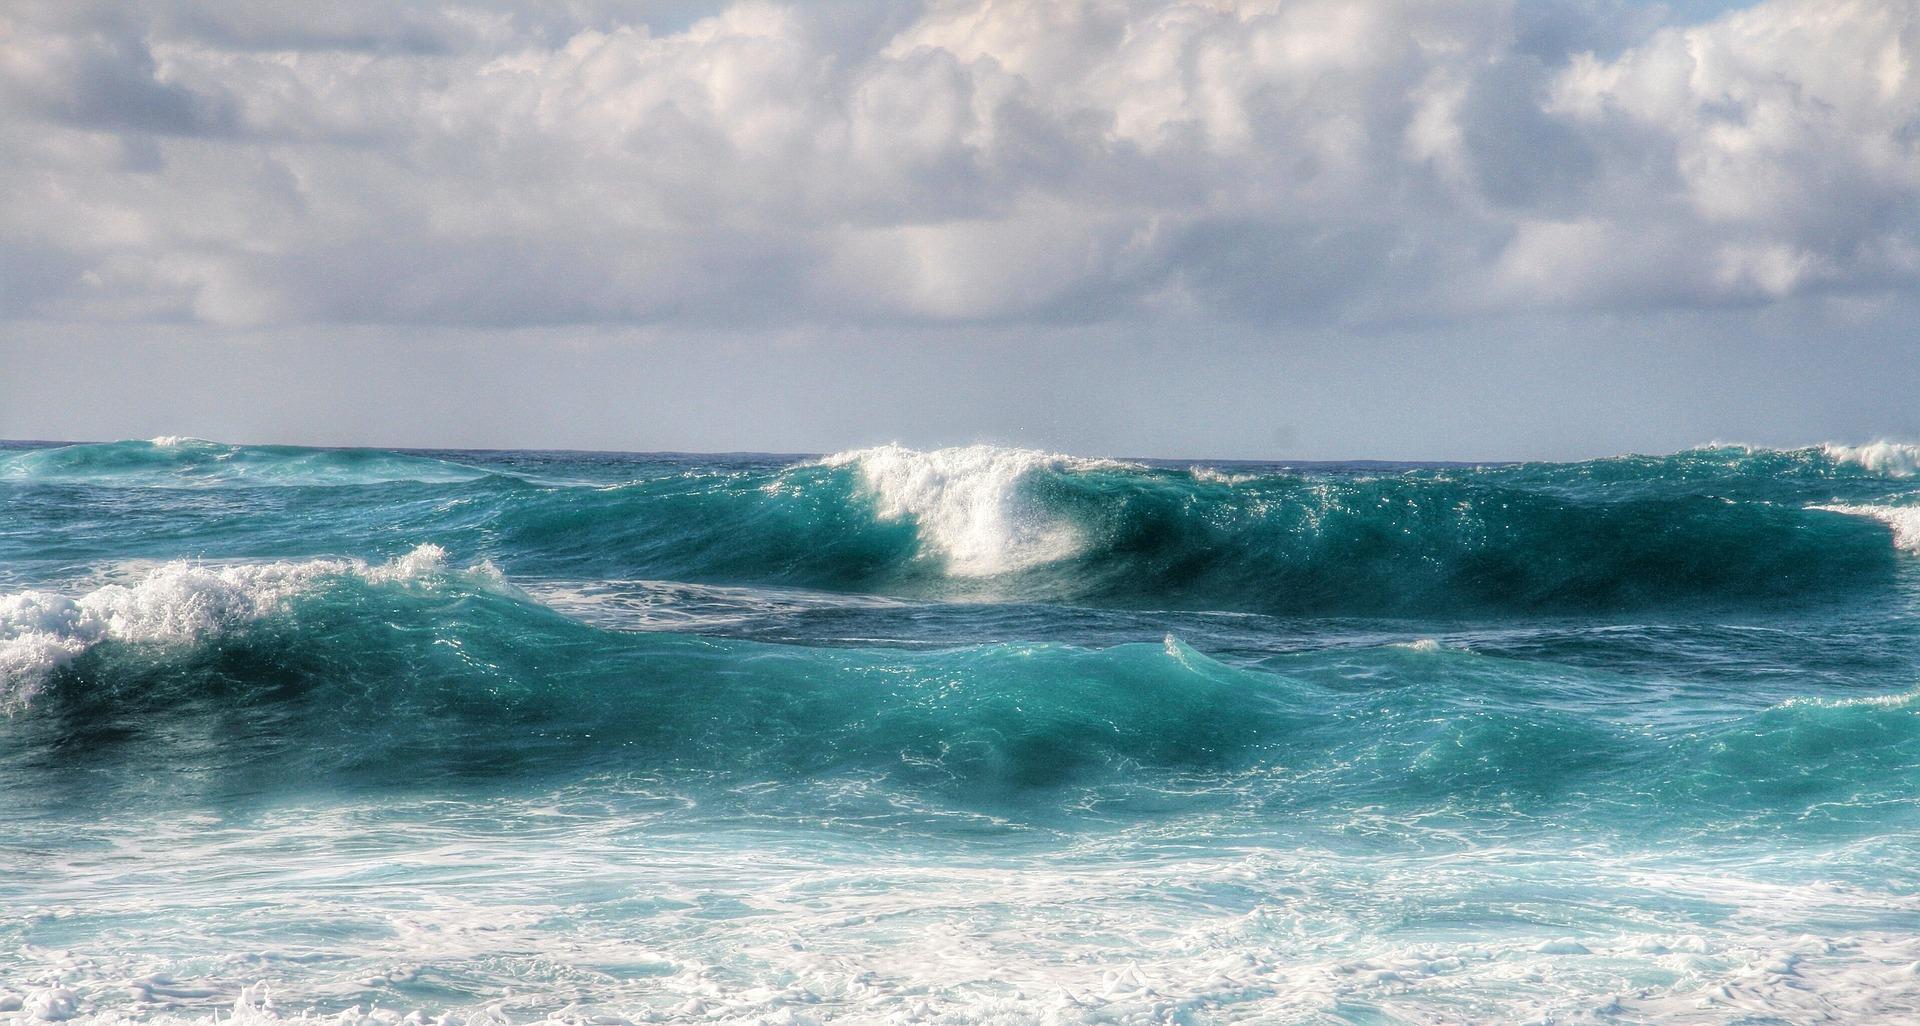 waves-1133973_1920